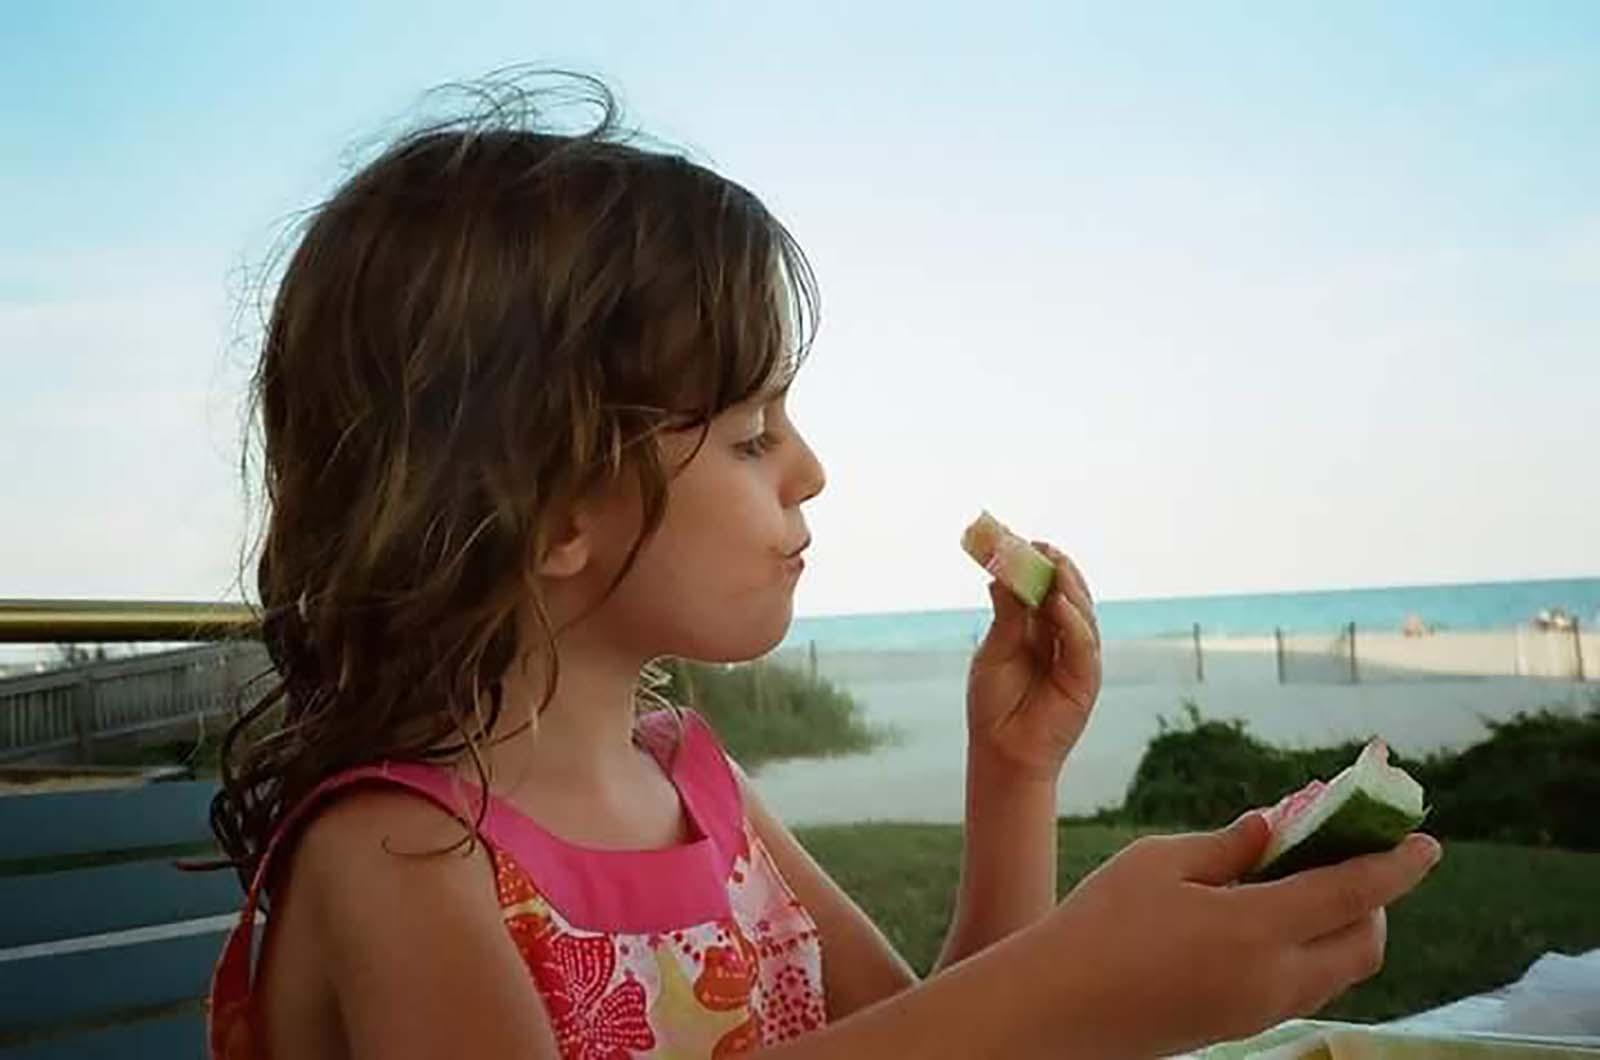 Little girl eating watermelon by beach